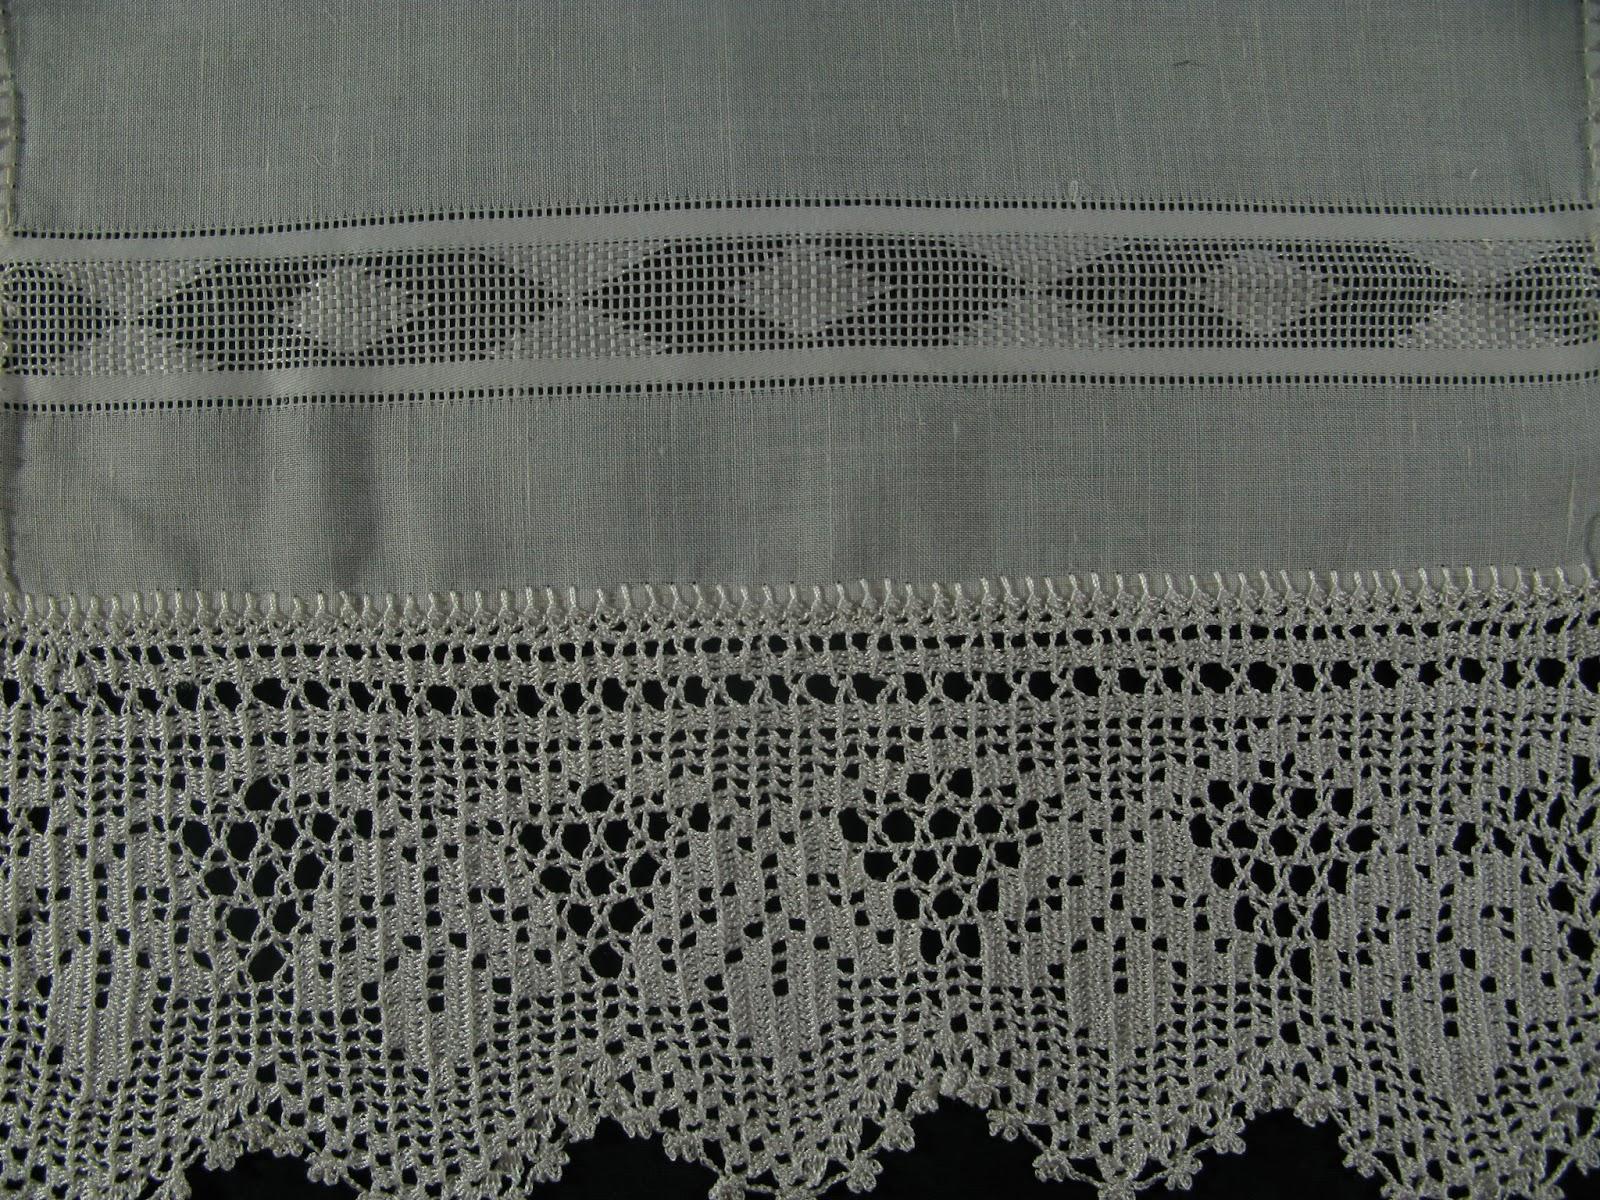 94aa86a55339 Αυτή είναι μια μεταξωτή πετσέτα που έχει μια πολύ όμορφη δαντέλα γύρω γύρω.